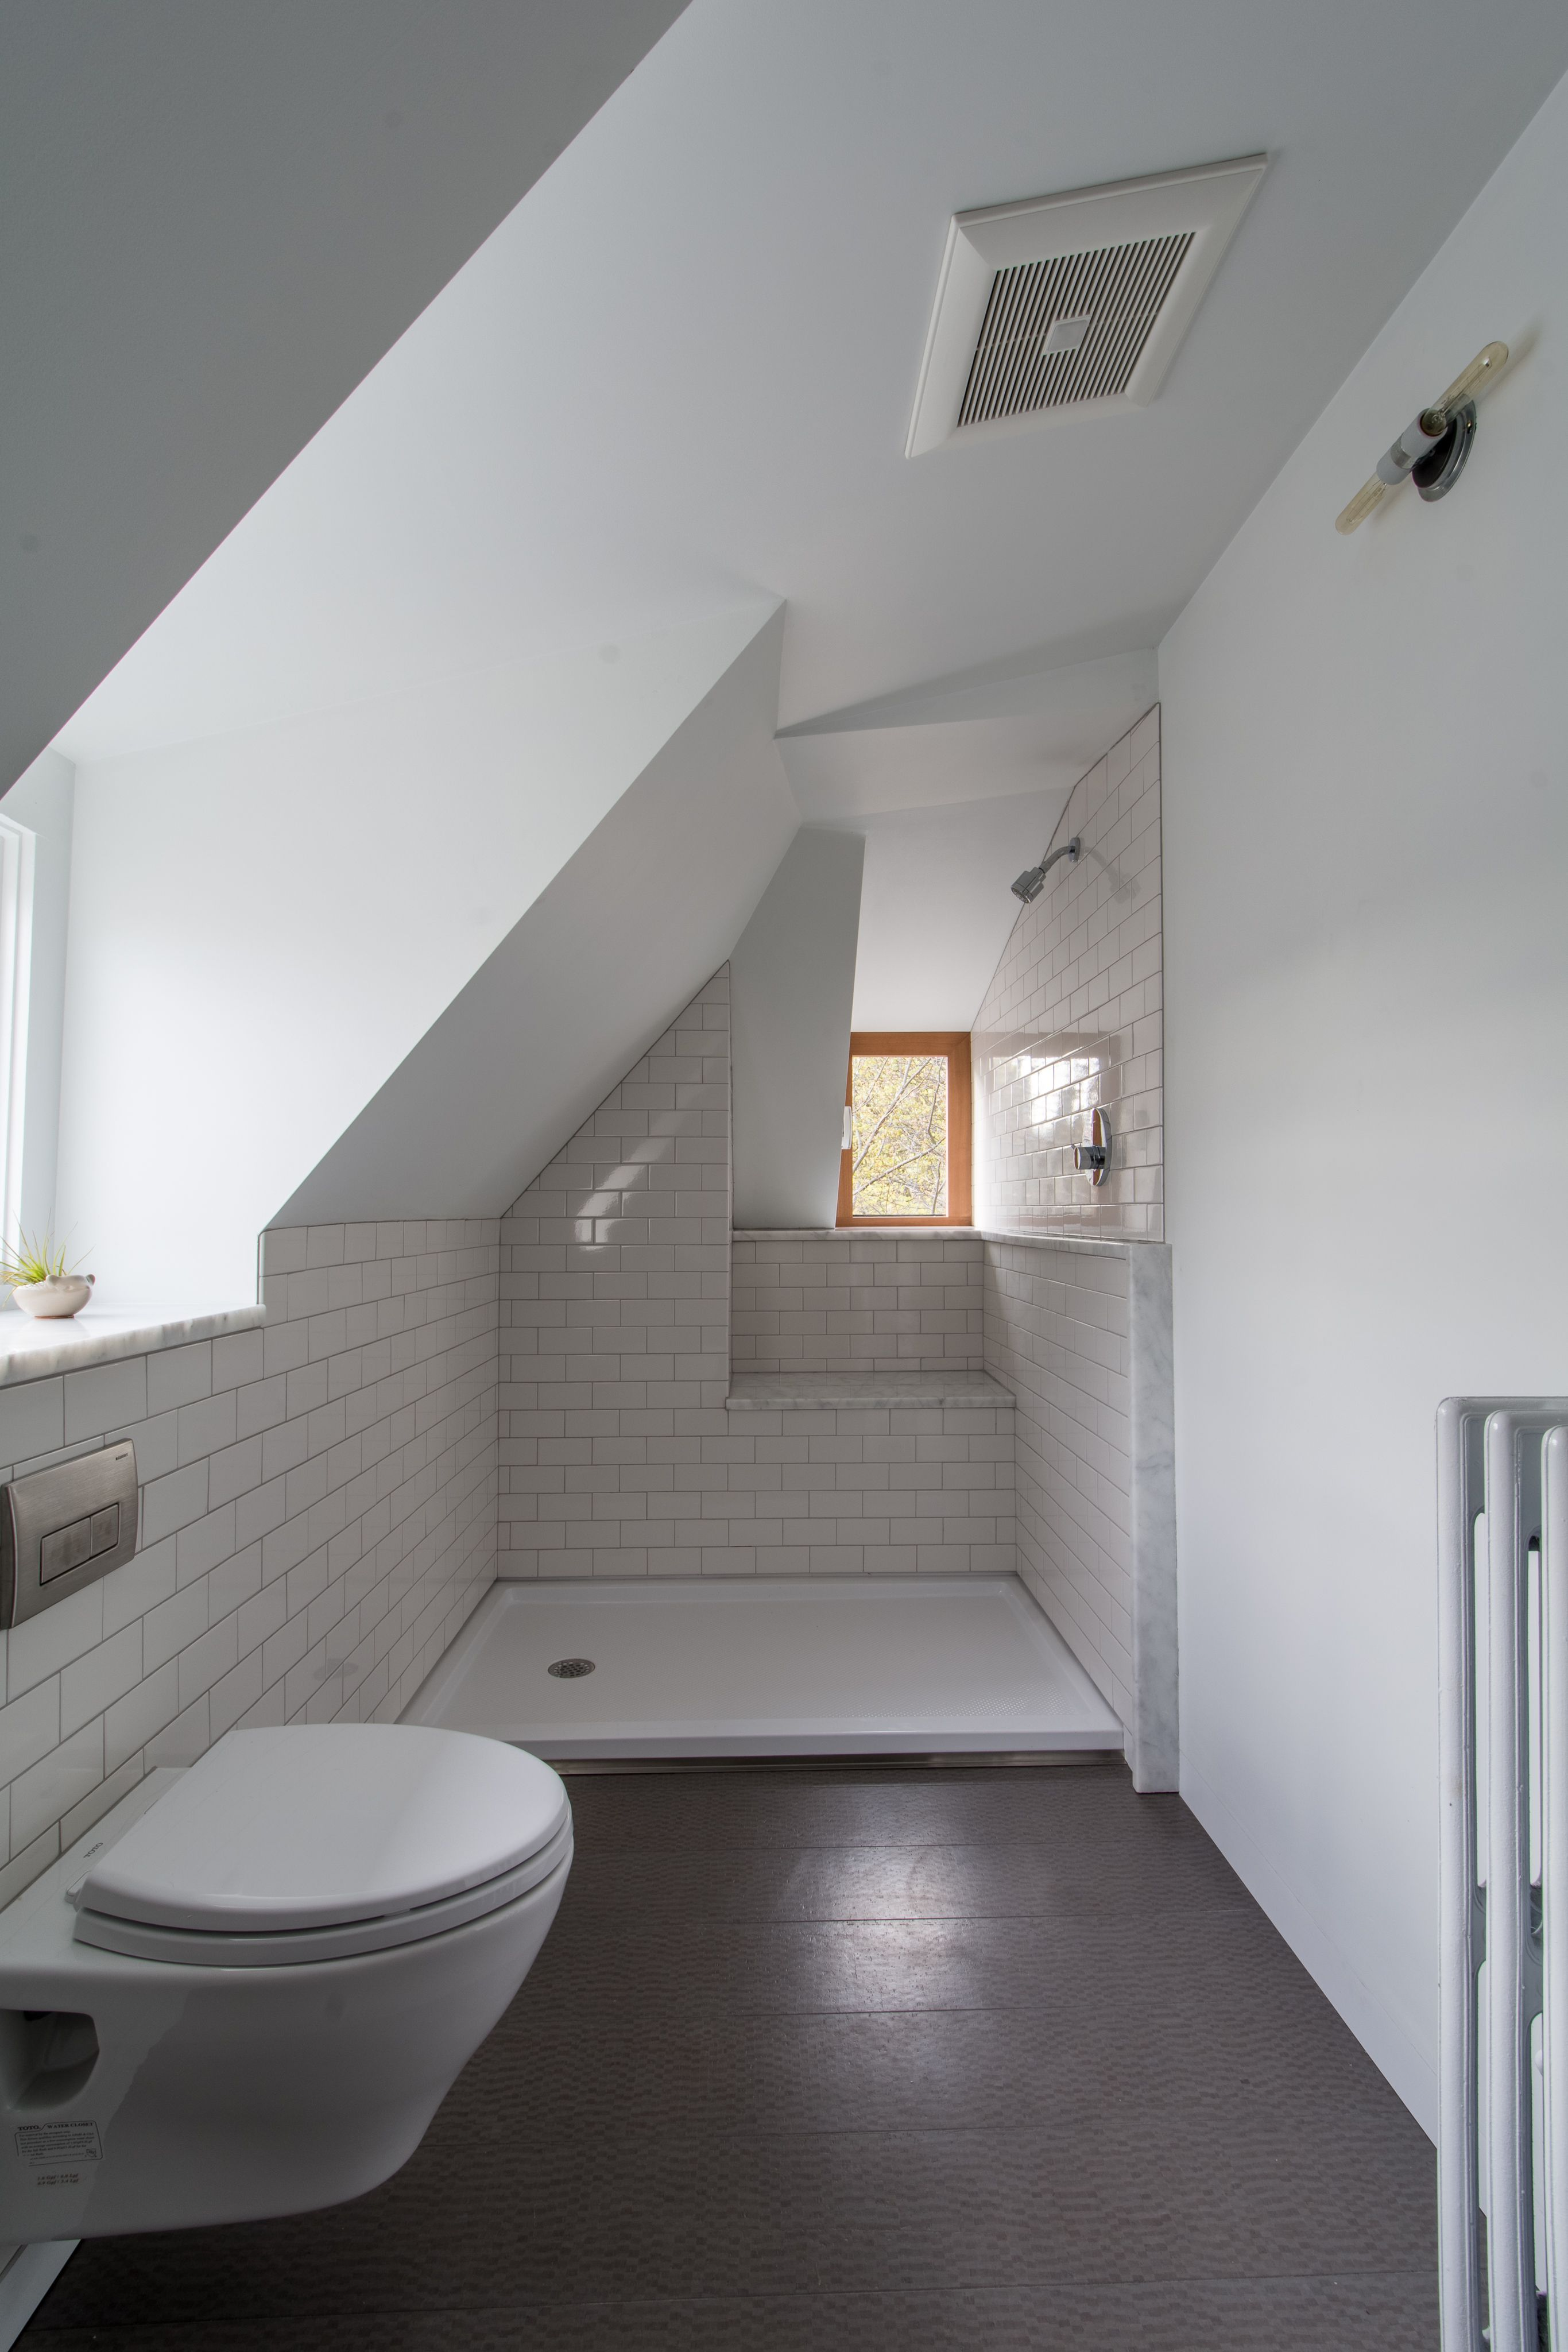 Bathroom Shower Attic Loft Eaves Small Attic Bathroom Attic Shower Attic Bathroom